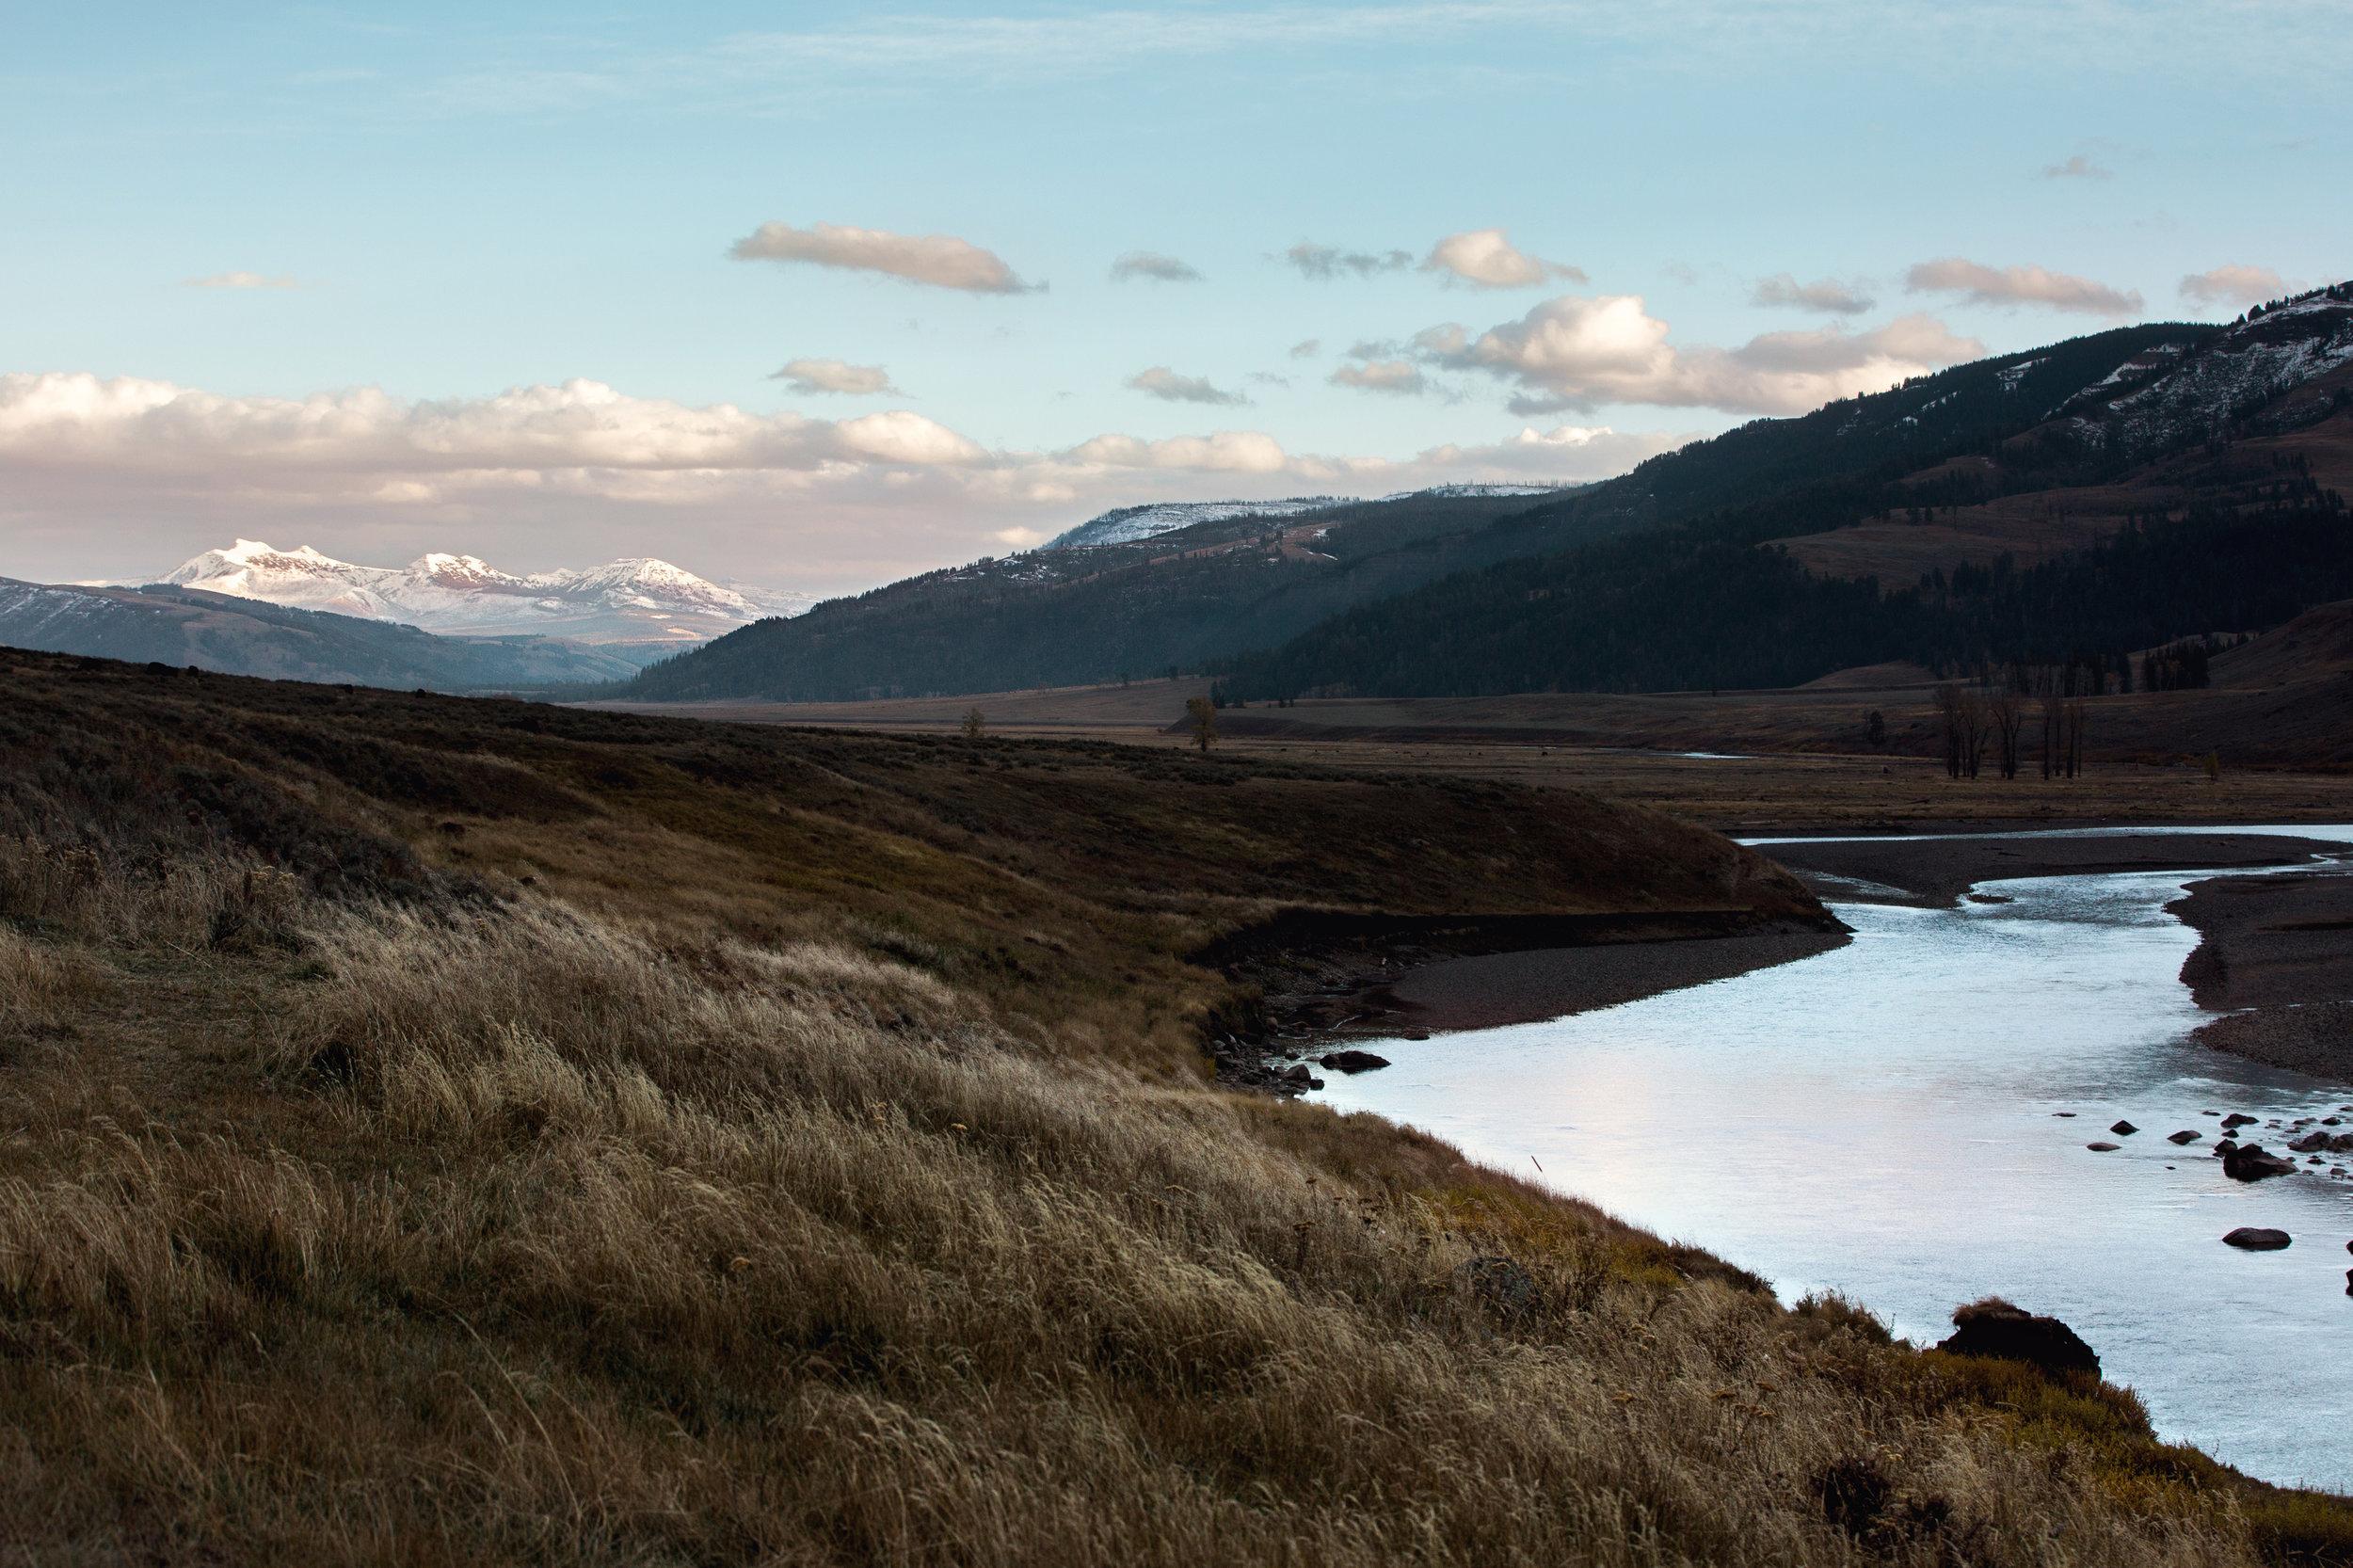 CindyGiovagnoli_Yellowstone_National_Park_Montana_Wyoming_bison_pronghorn_snow_elk_truckcamping-014.jpg